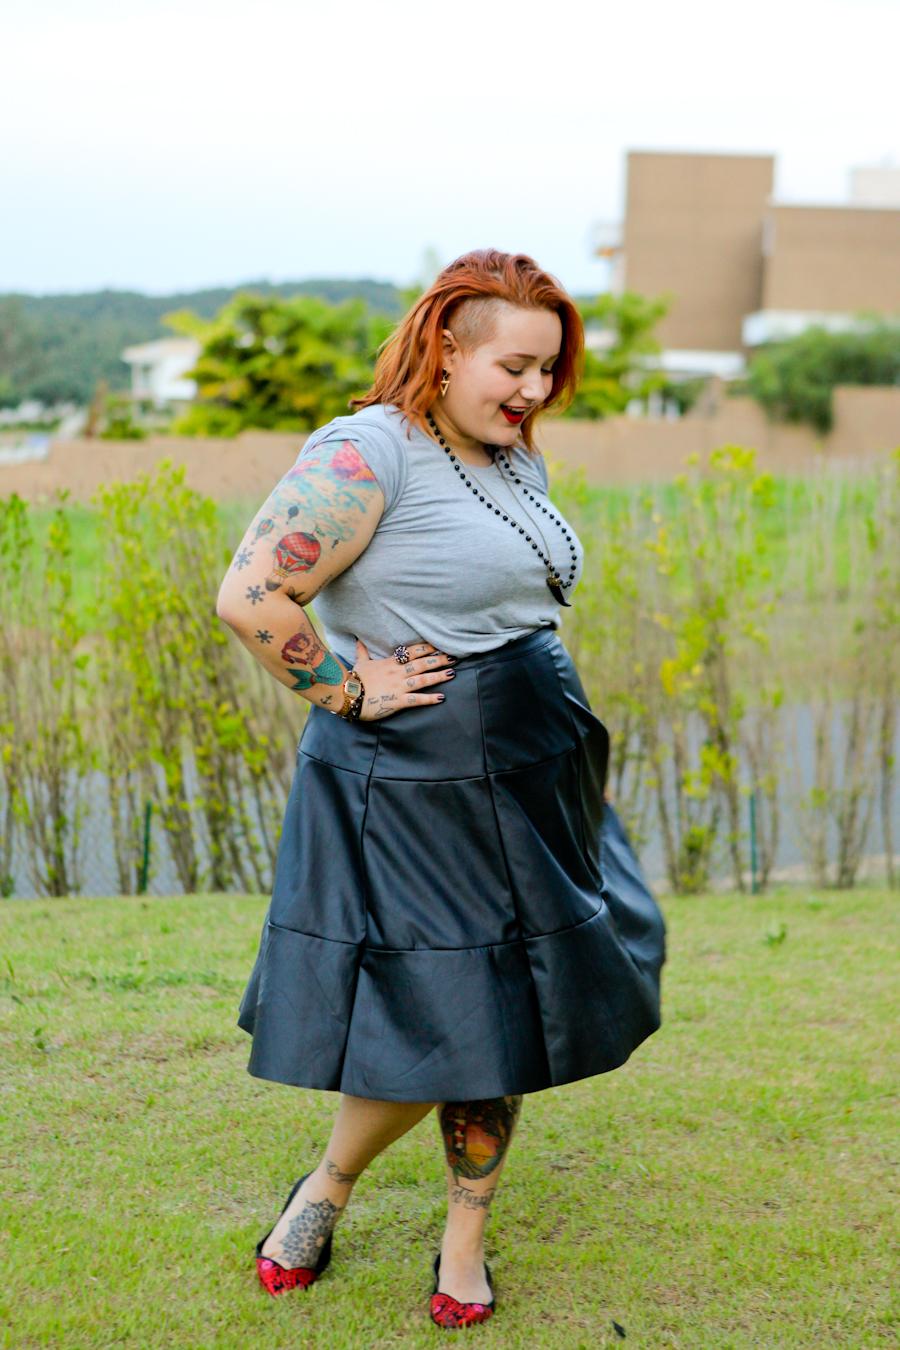 femme_fatale_Jessica_lopes_blogger